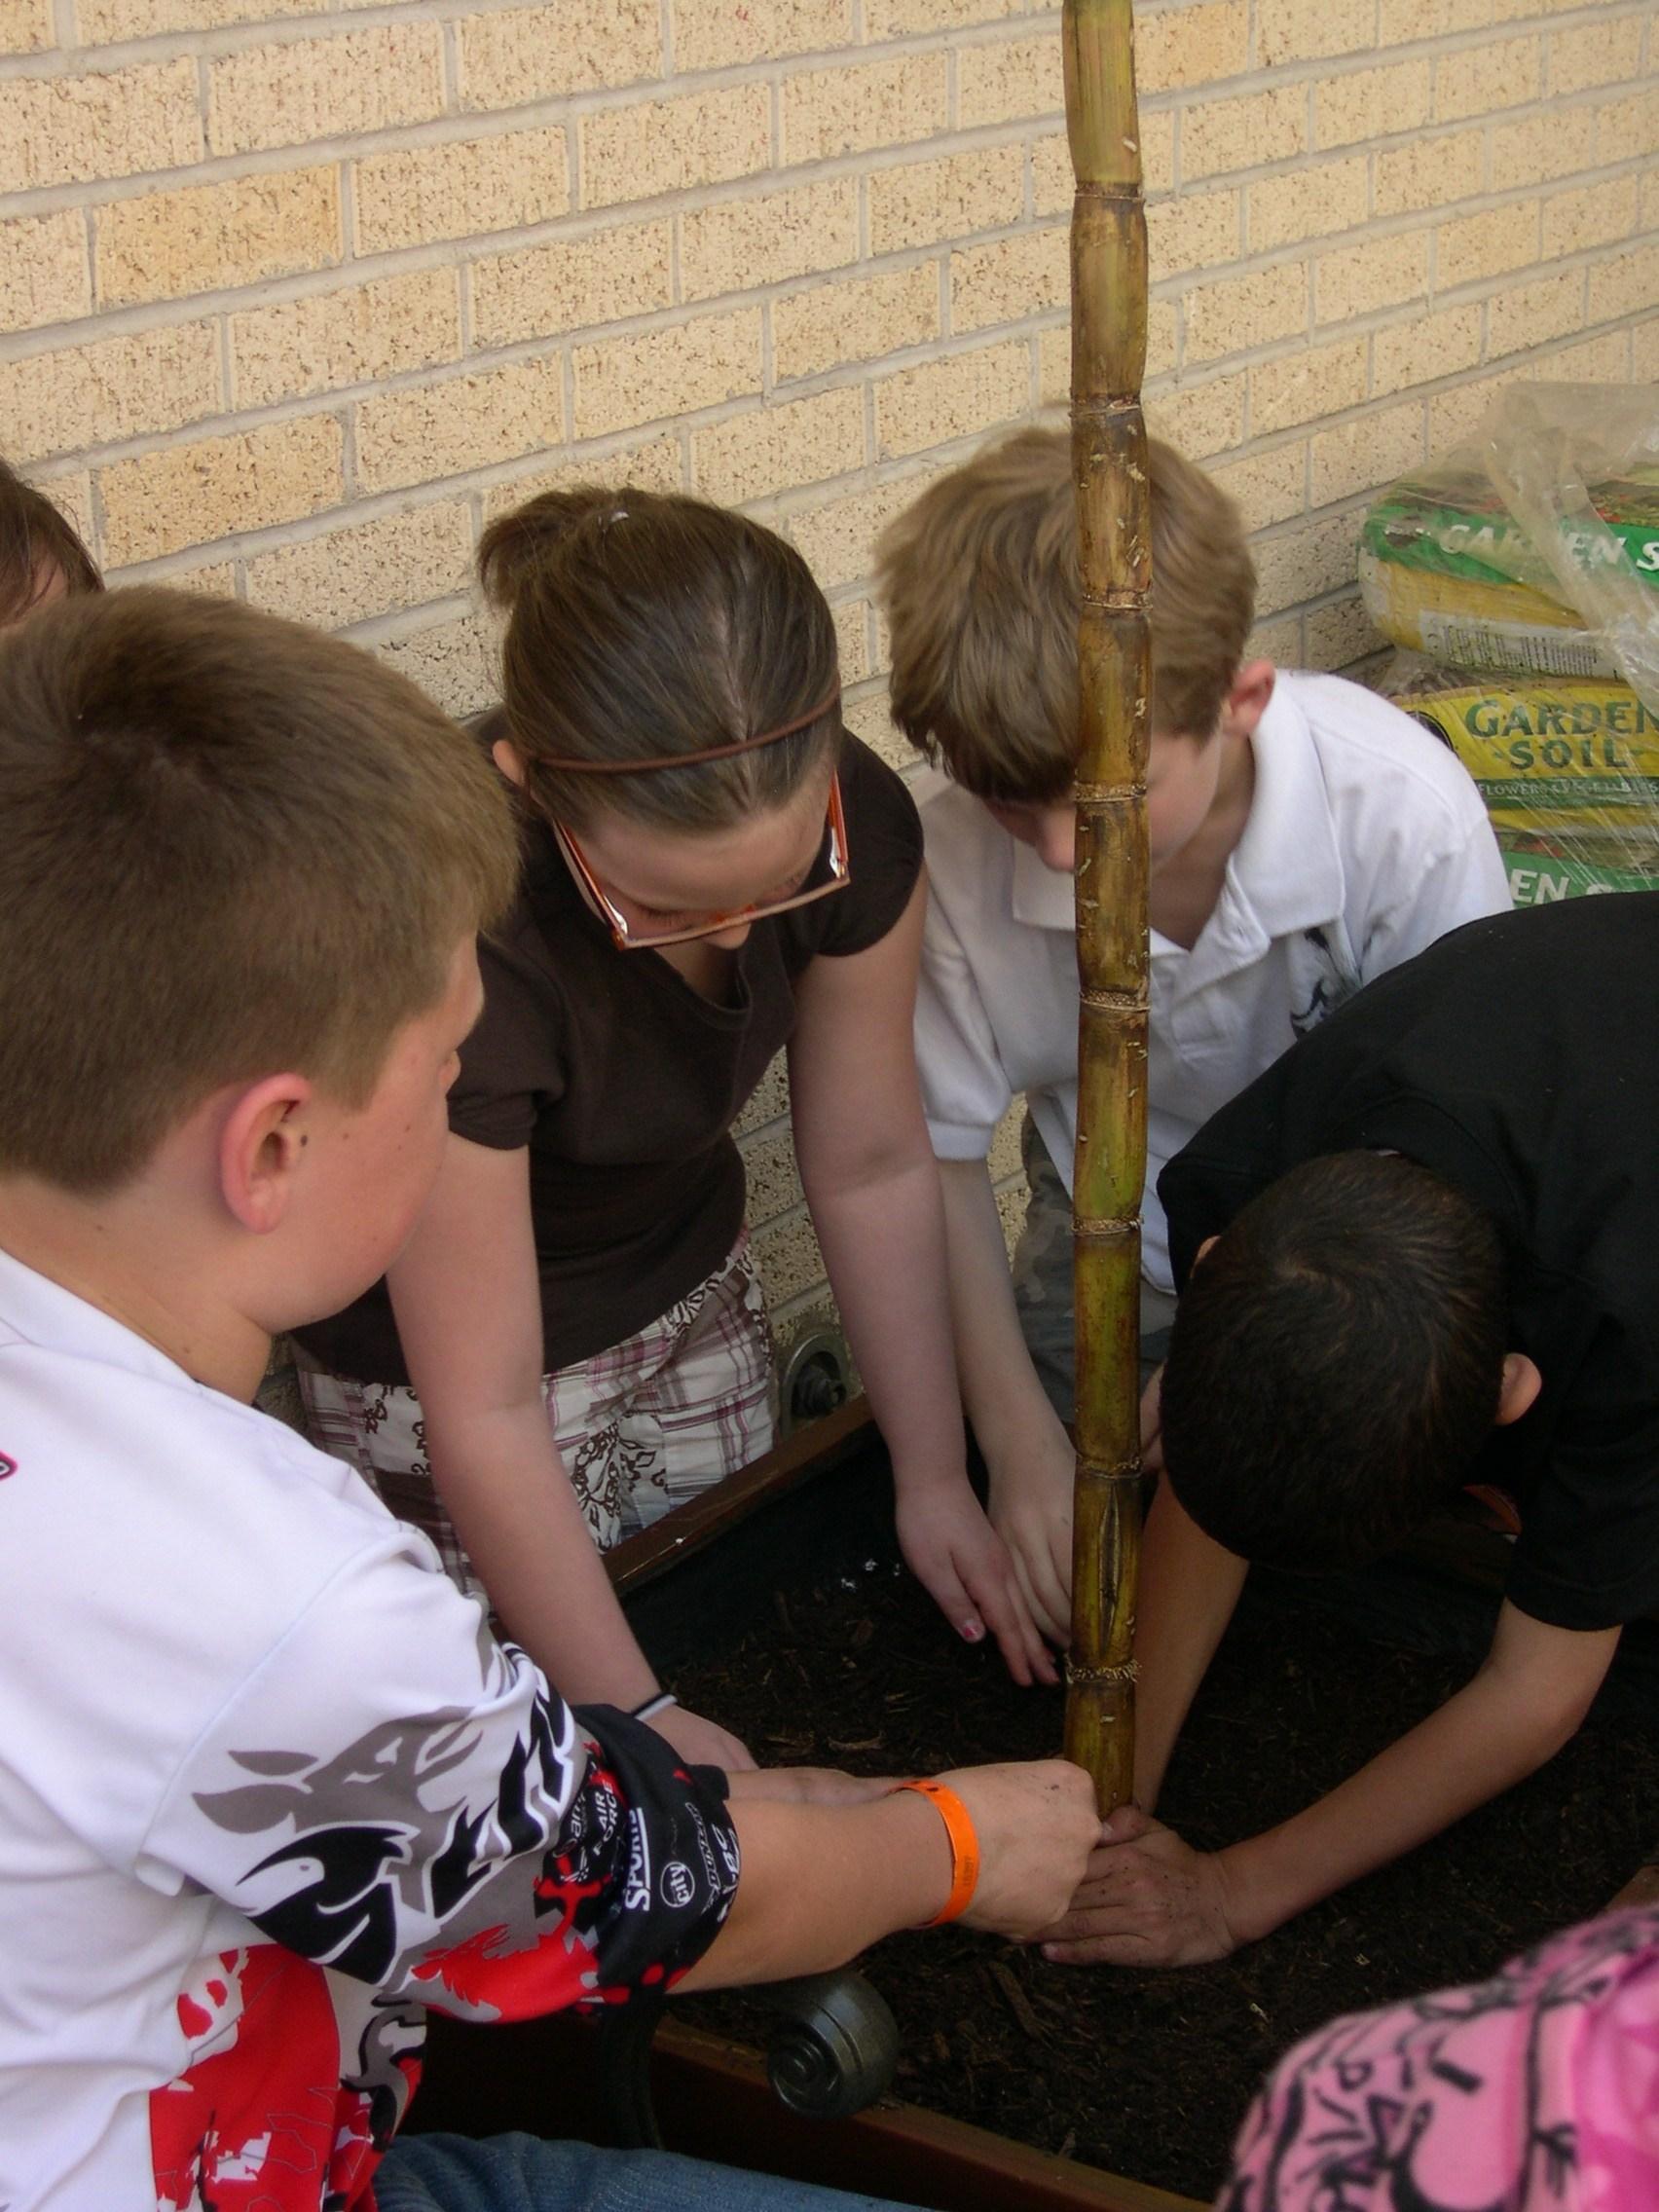 Tony Goetz students enjoying their garden (Muskogee, 2009)